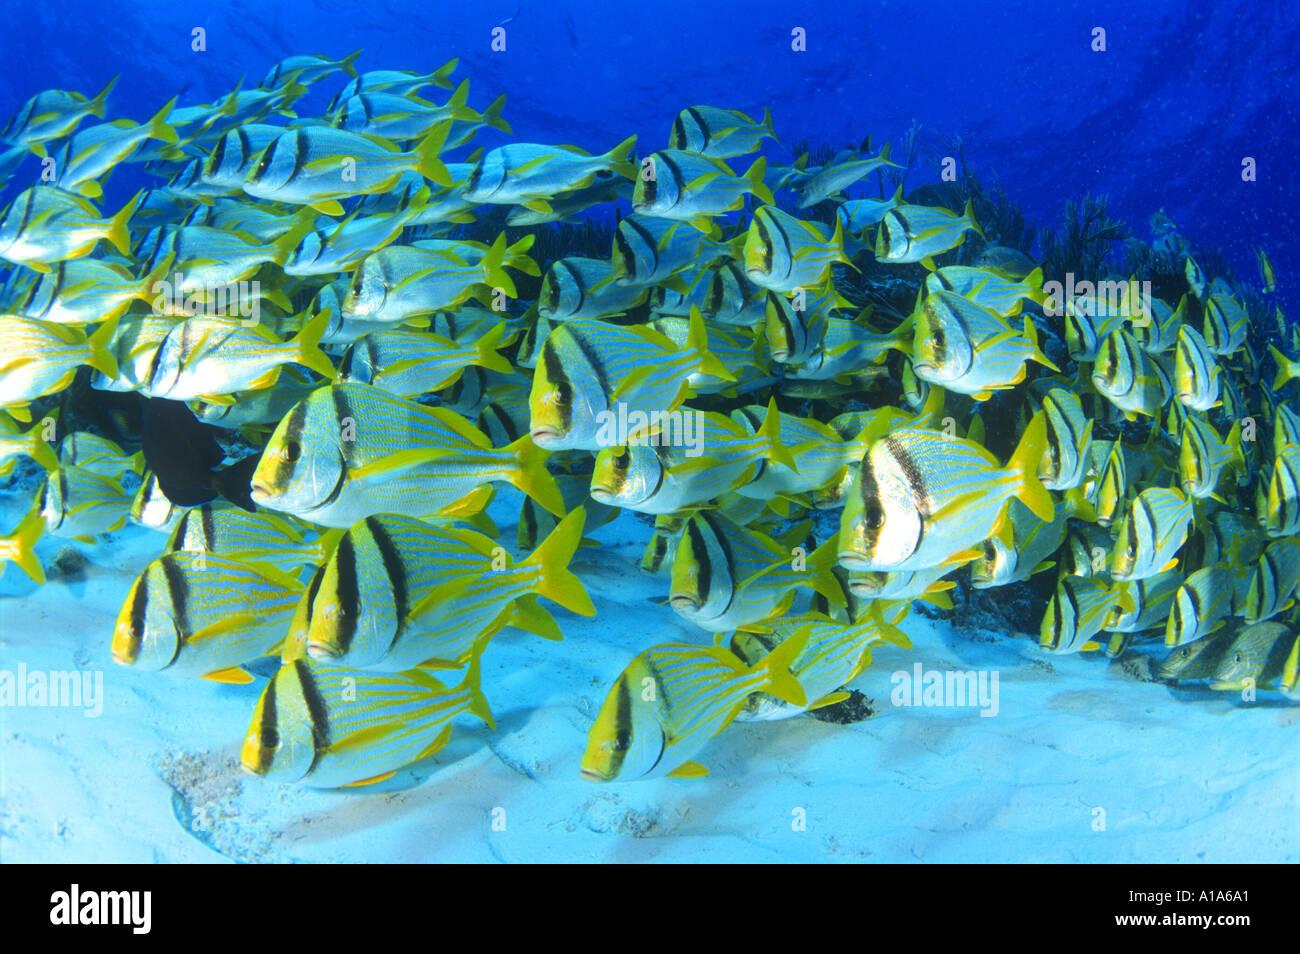 School of fish underwater mexico scuba diving ocean for School of fish